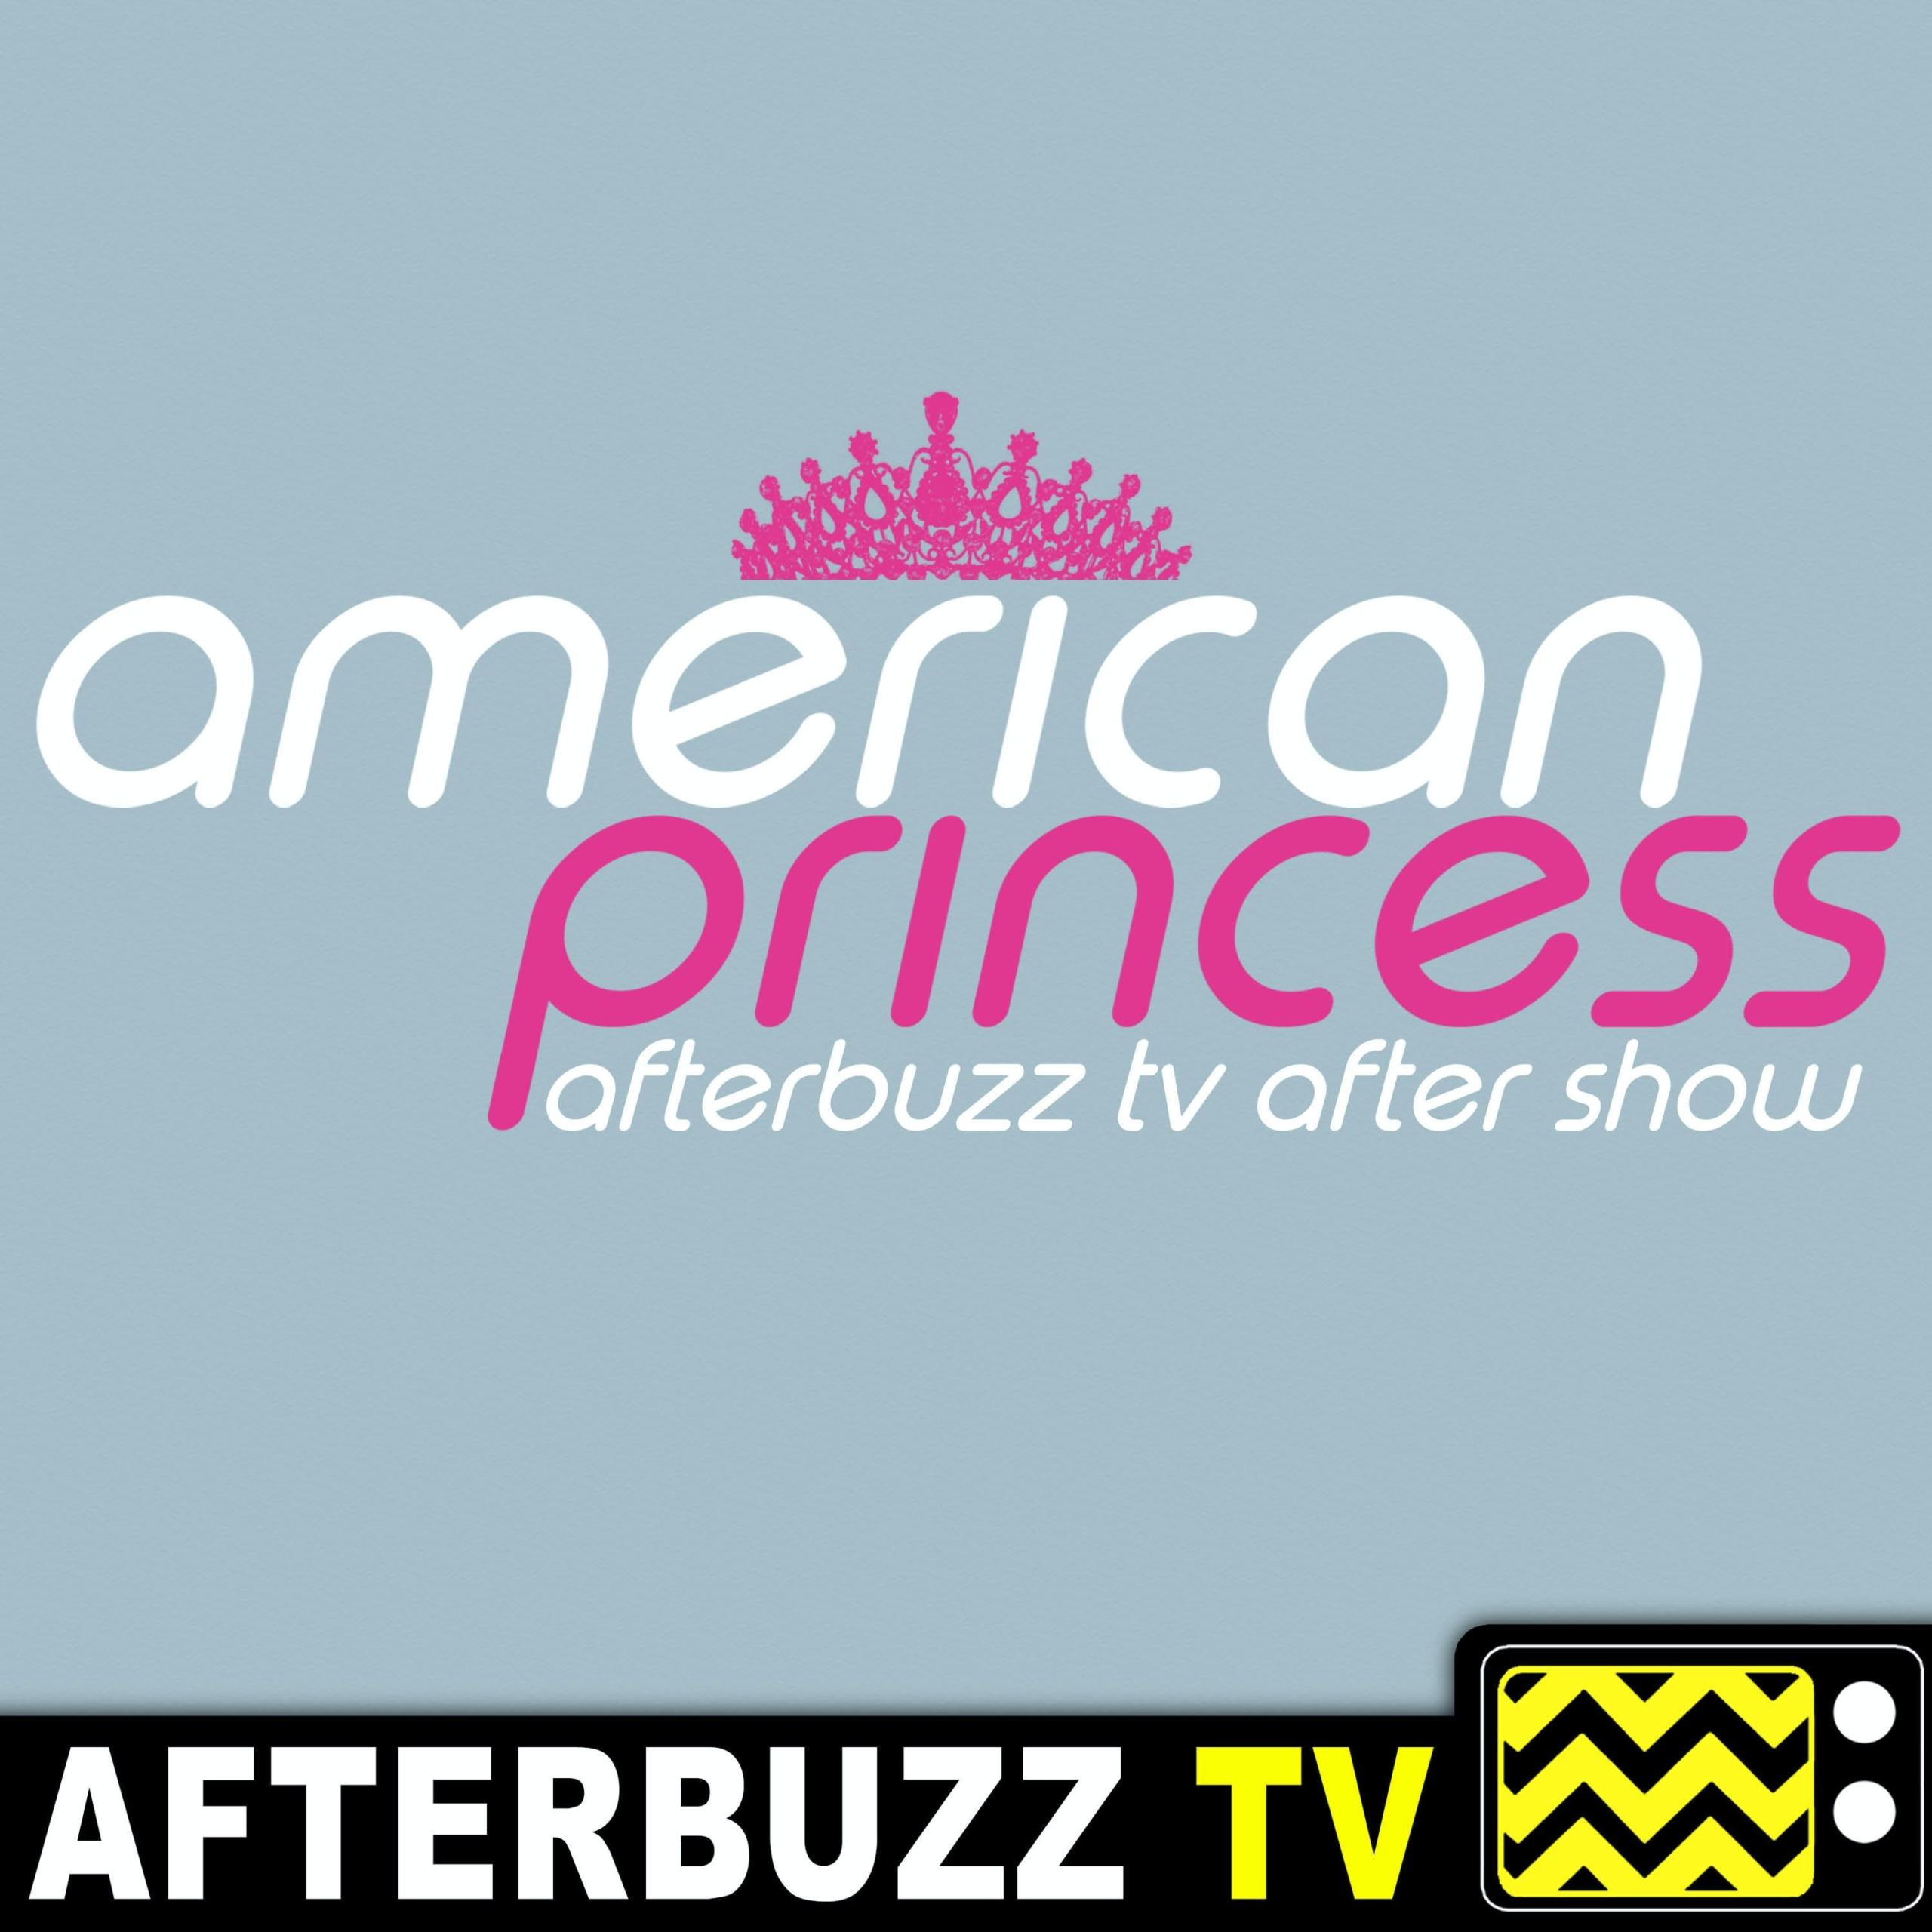 Rory O'Malley in Studio for Season 1 Special 'American Princess'